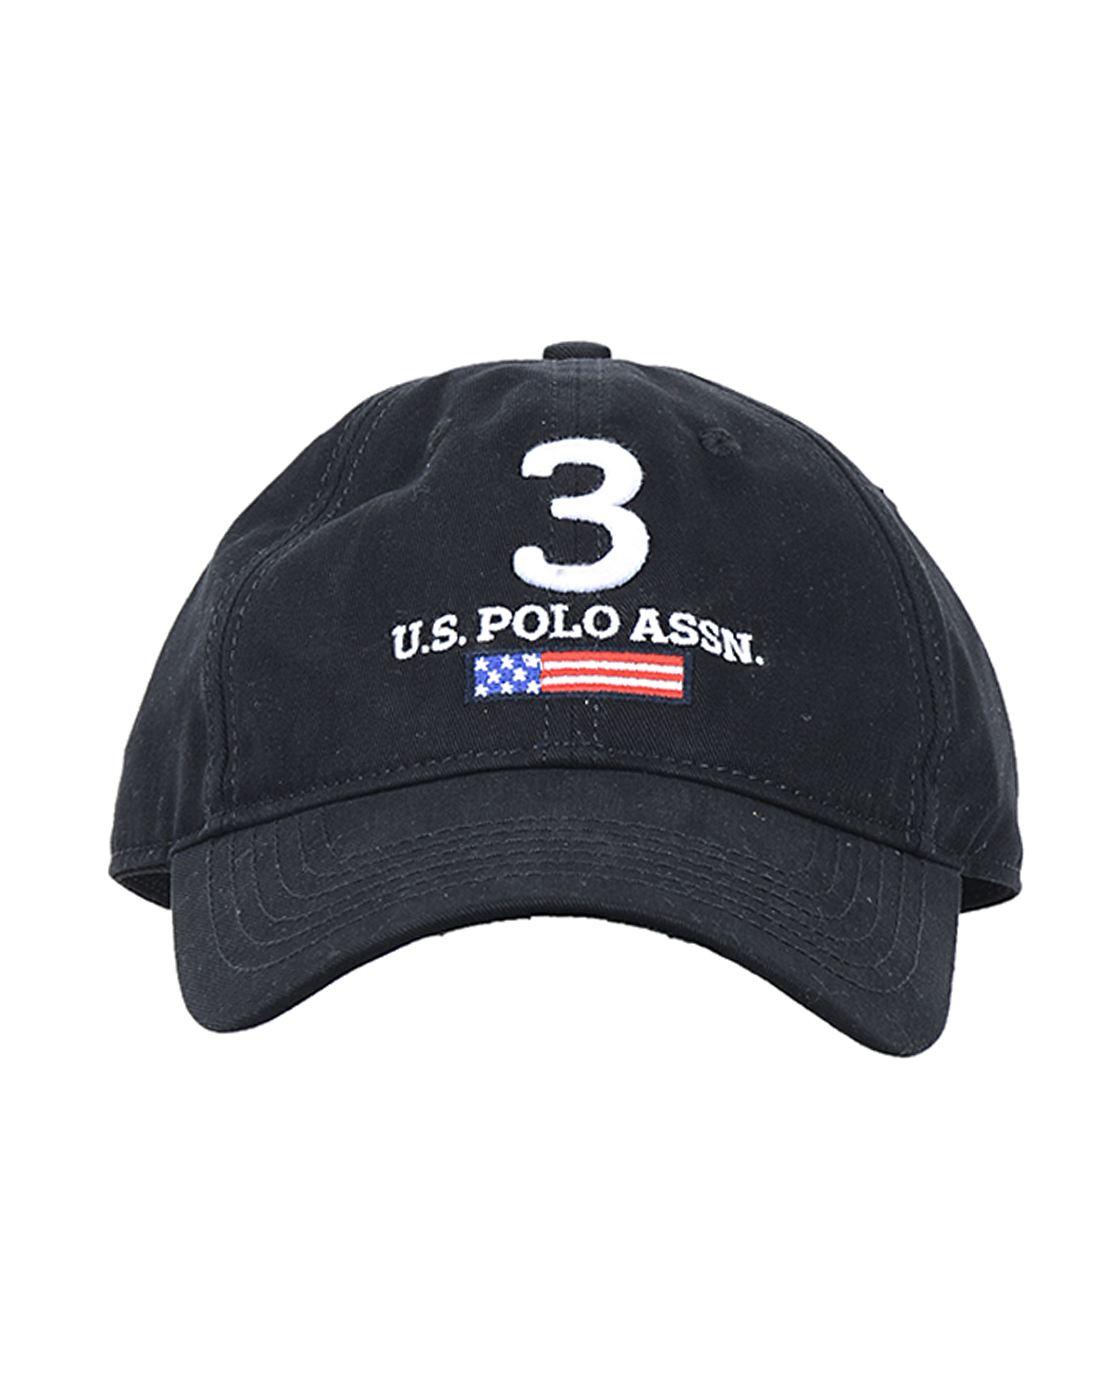 U.S.Polo Association Men Six Panel Baseball Cap